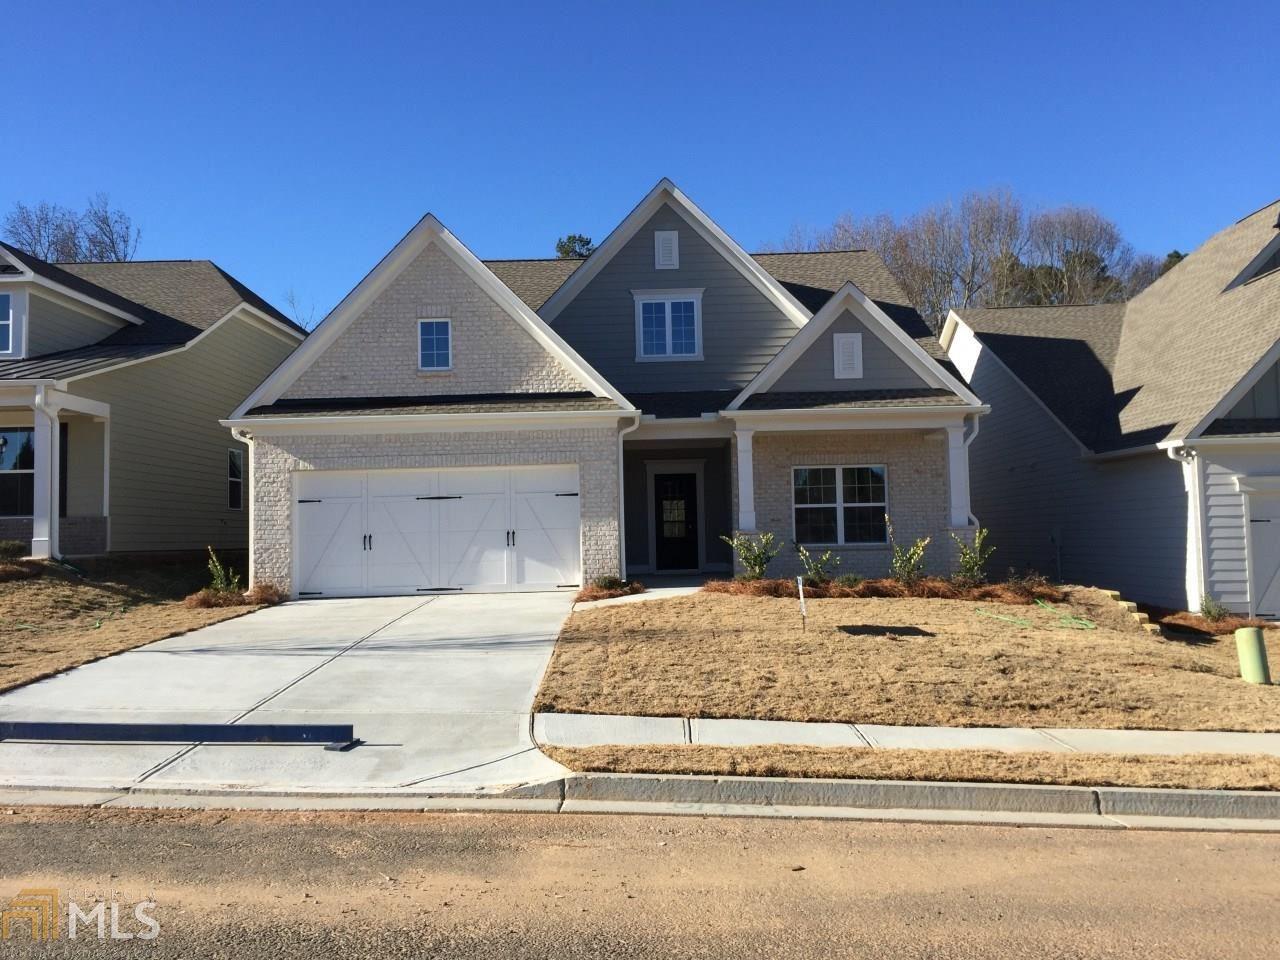 5021 Watchmans Cv, Gainesville, GA 30504 - MLS#: 8904532